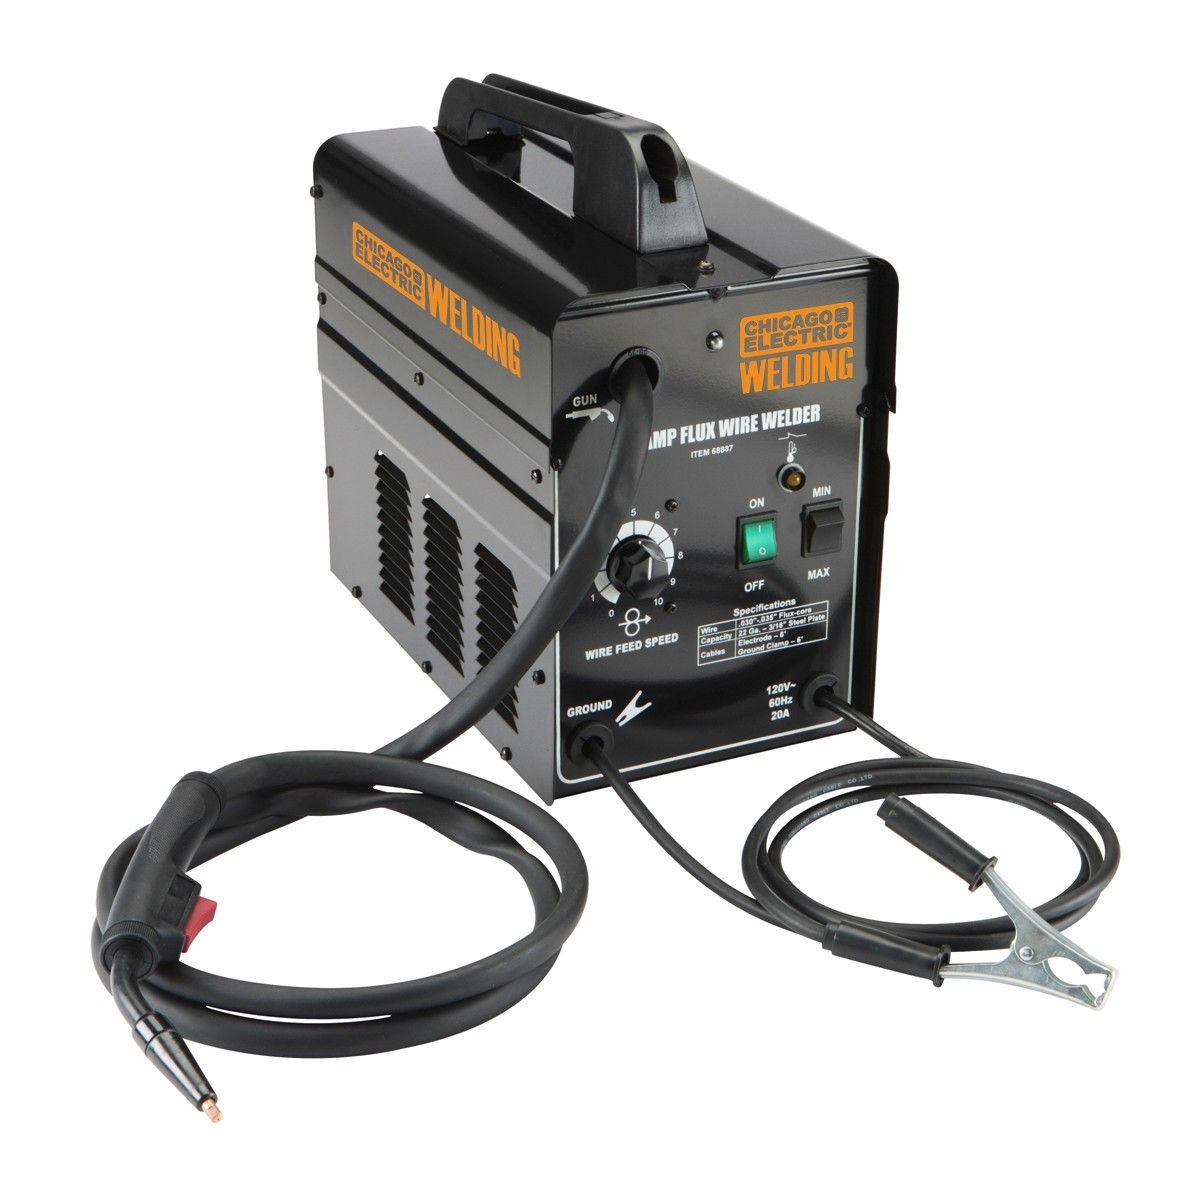 89 99 chicago electric welding 68887 90 amp flux wire welder black friday blackfriday harborfreight [ 1200 x 1200 Pixel ]